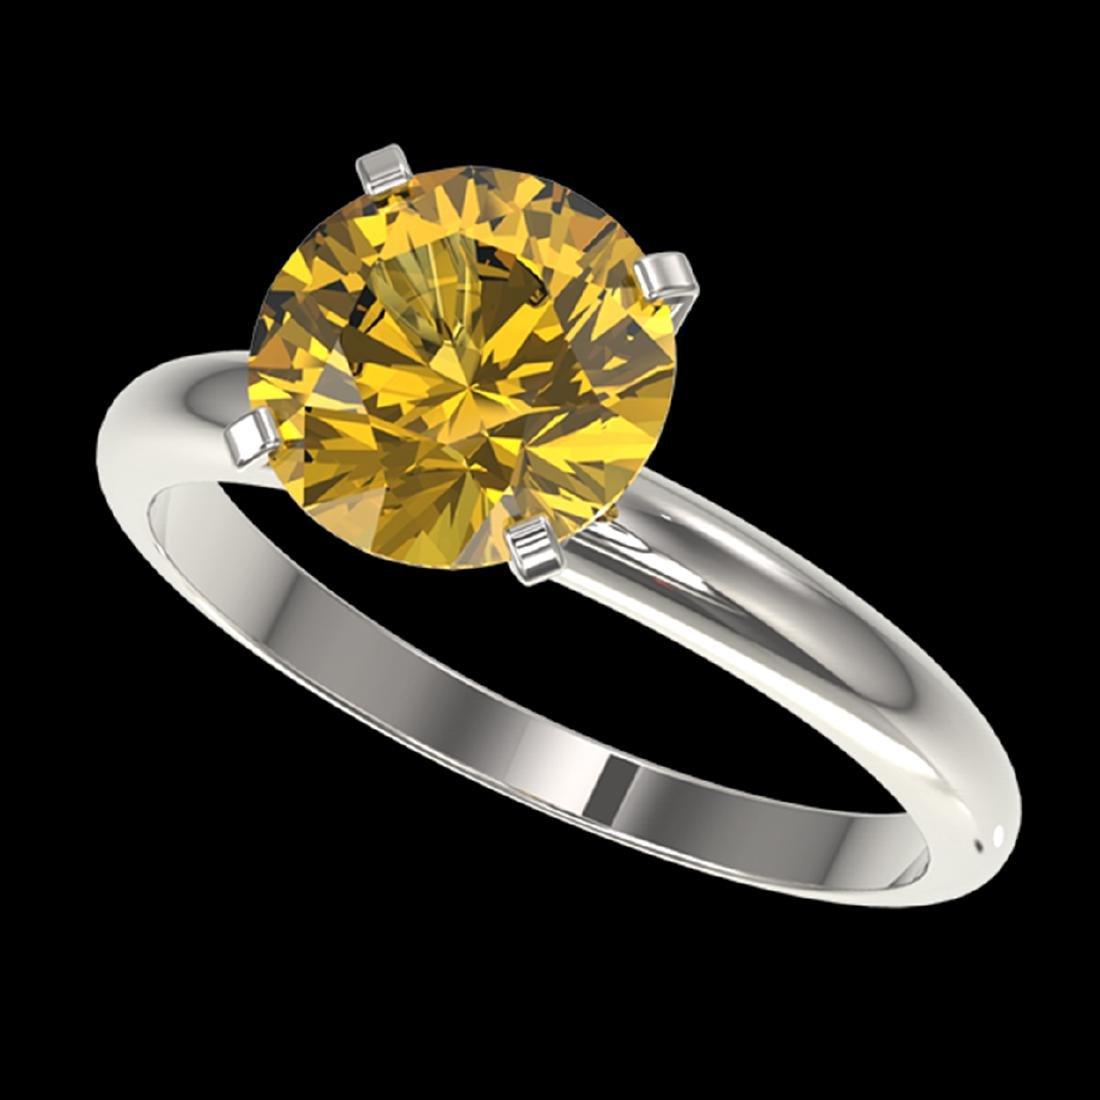 2.50 ctw Intense Yellow Diamond Solitaire Ring 10K